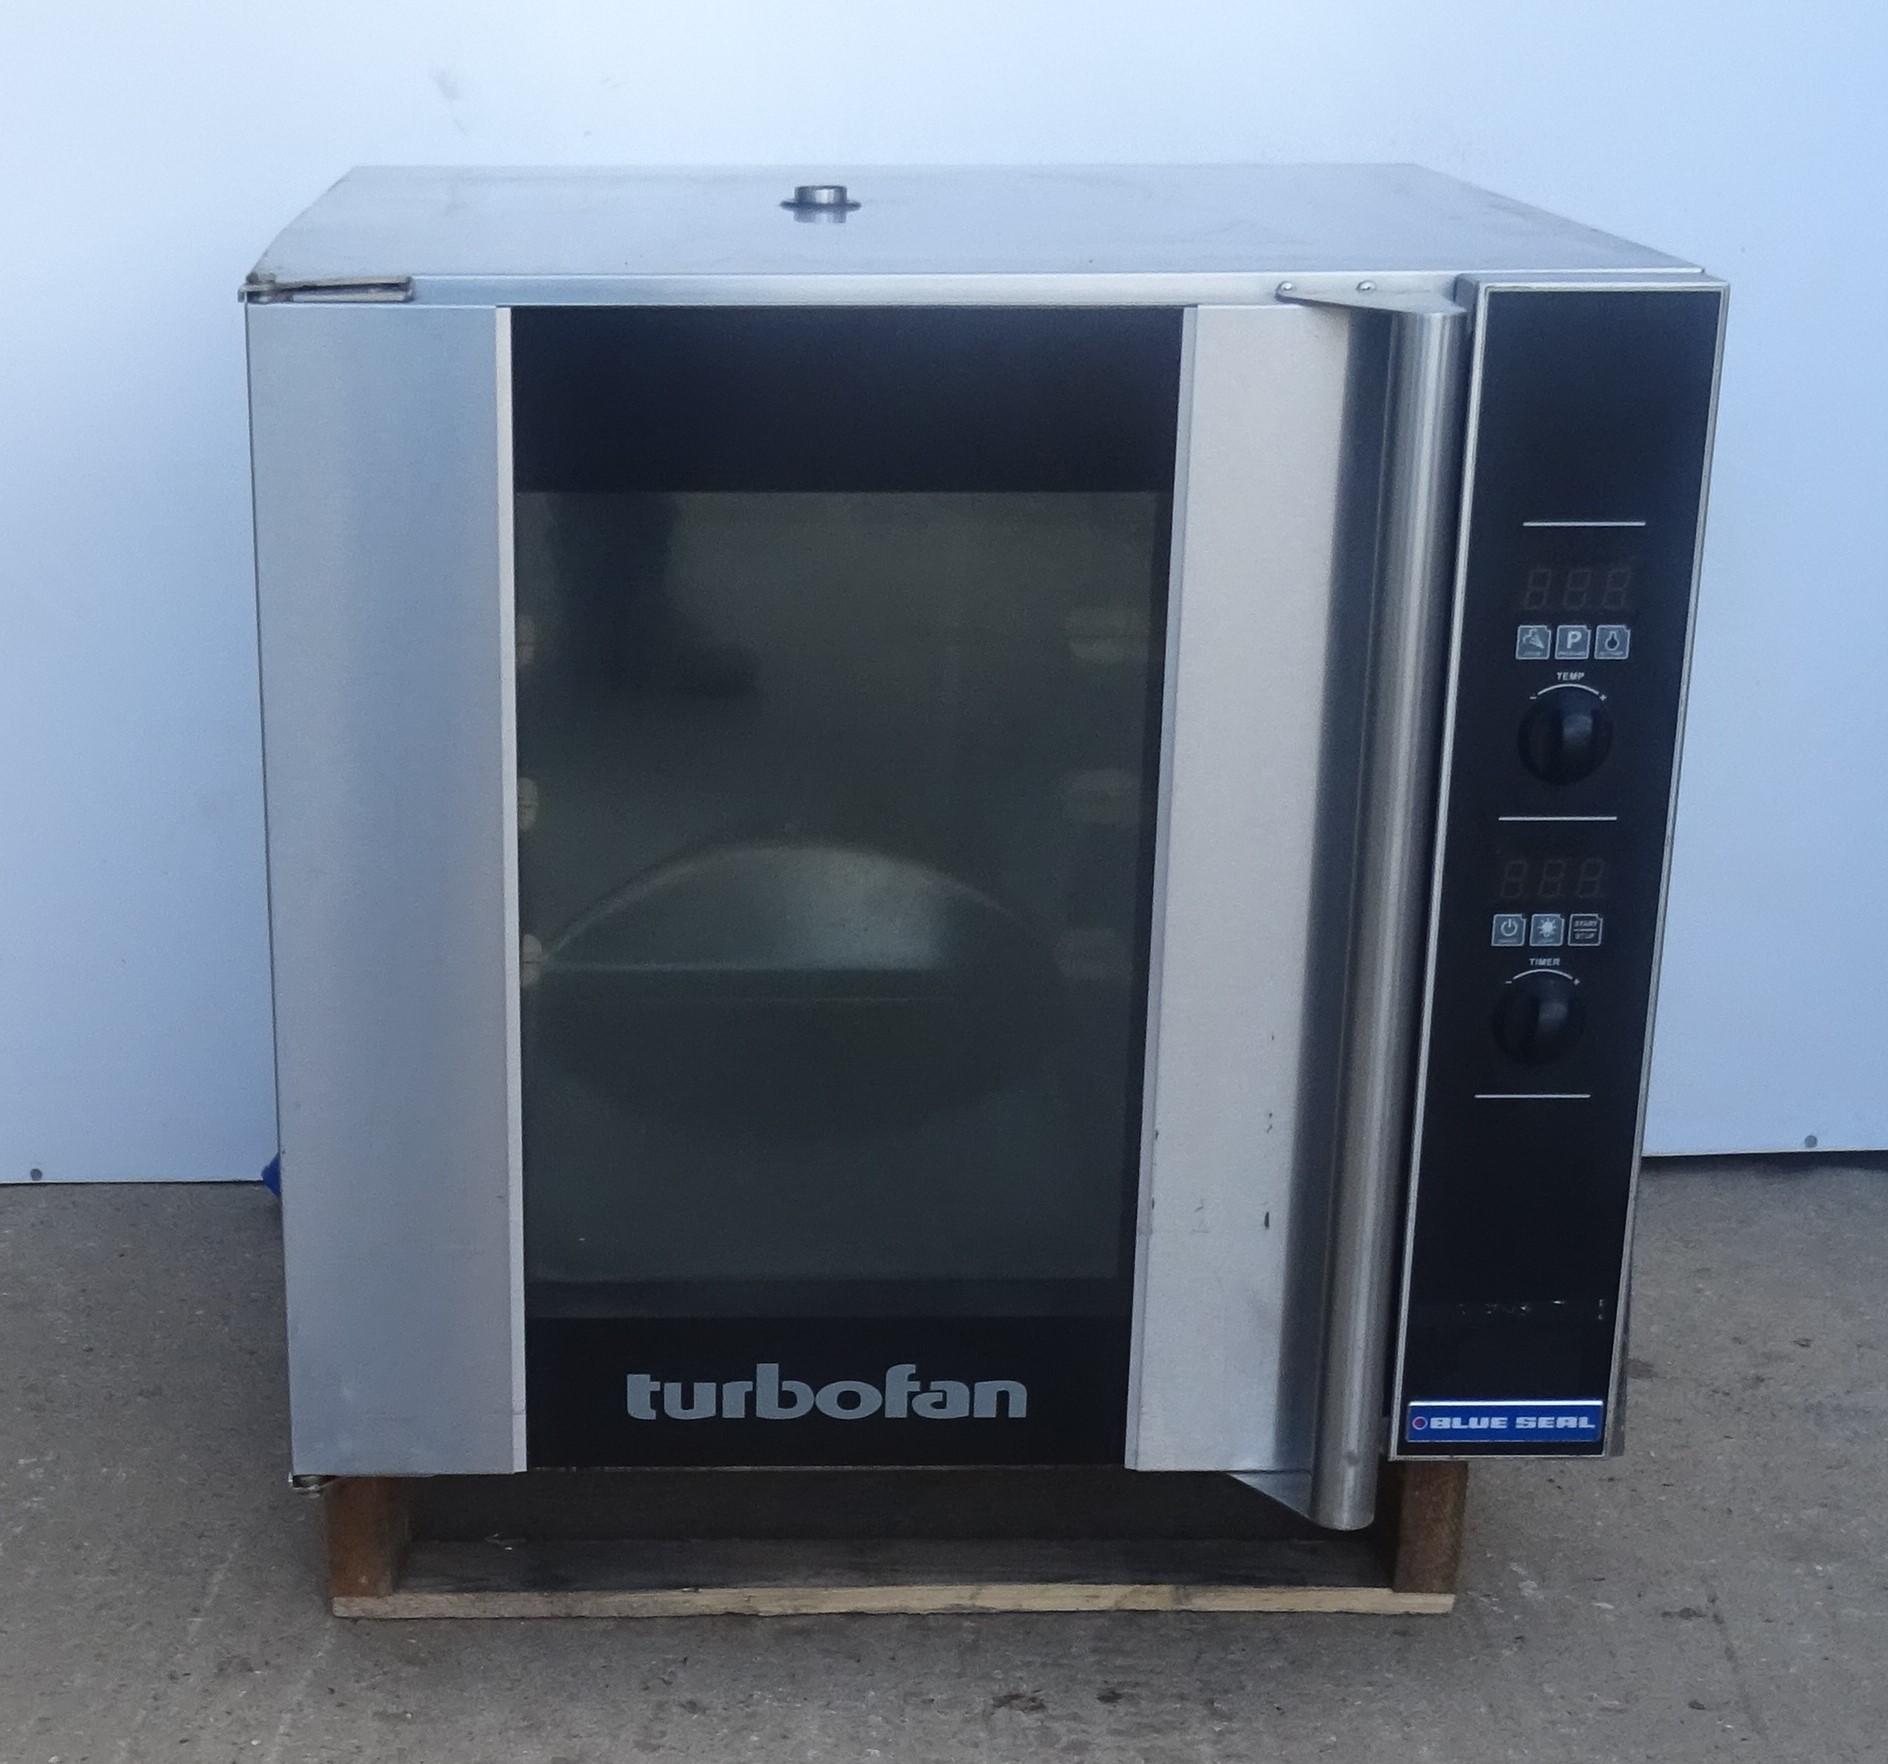 BLUE SEAL Turbofan E32 D4 Convection Oven